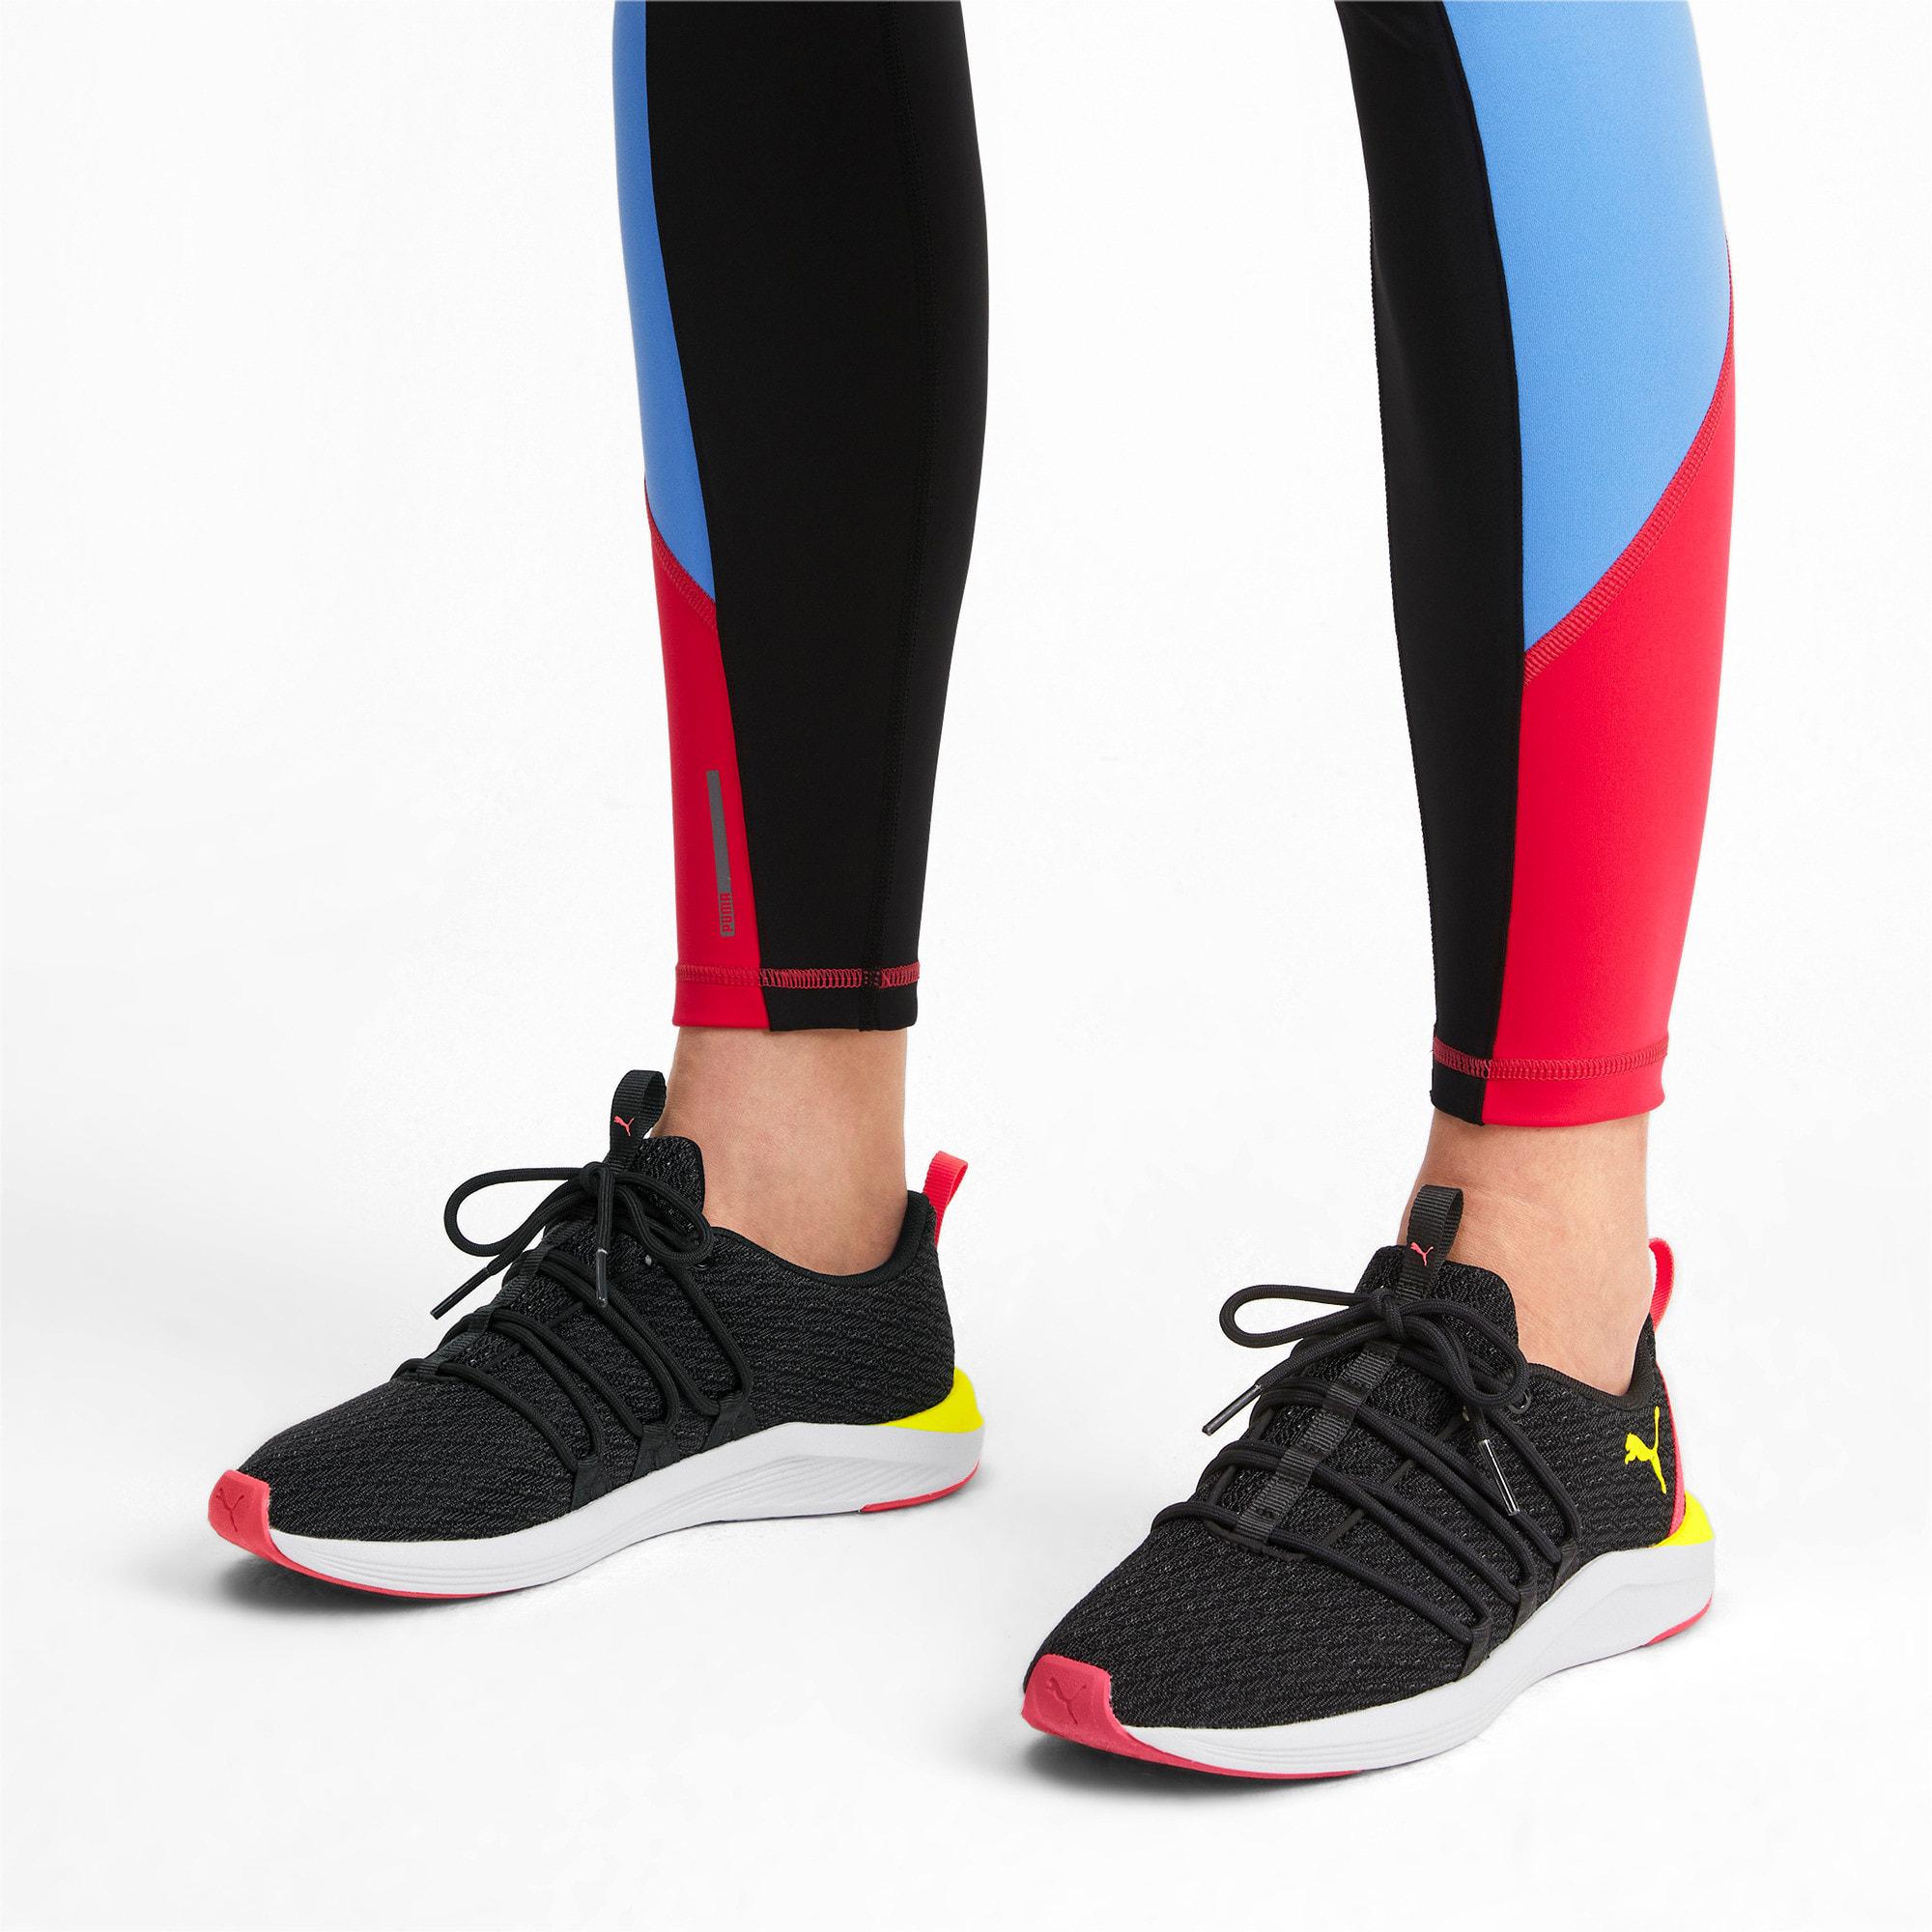 Thumbnail 2 of Prowl Alt Neon Women's Training Shoes, Puma Black-Yellow Alert, medium